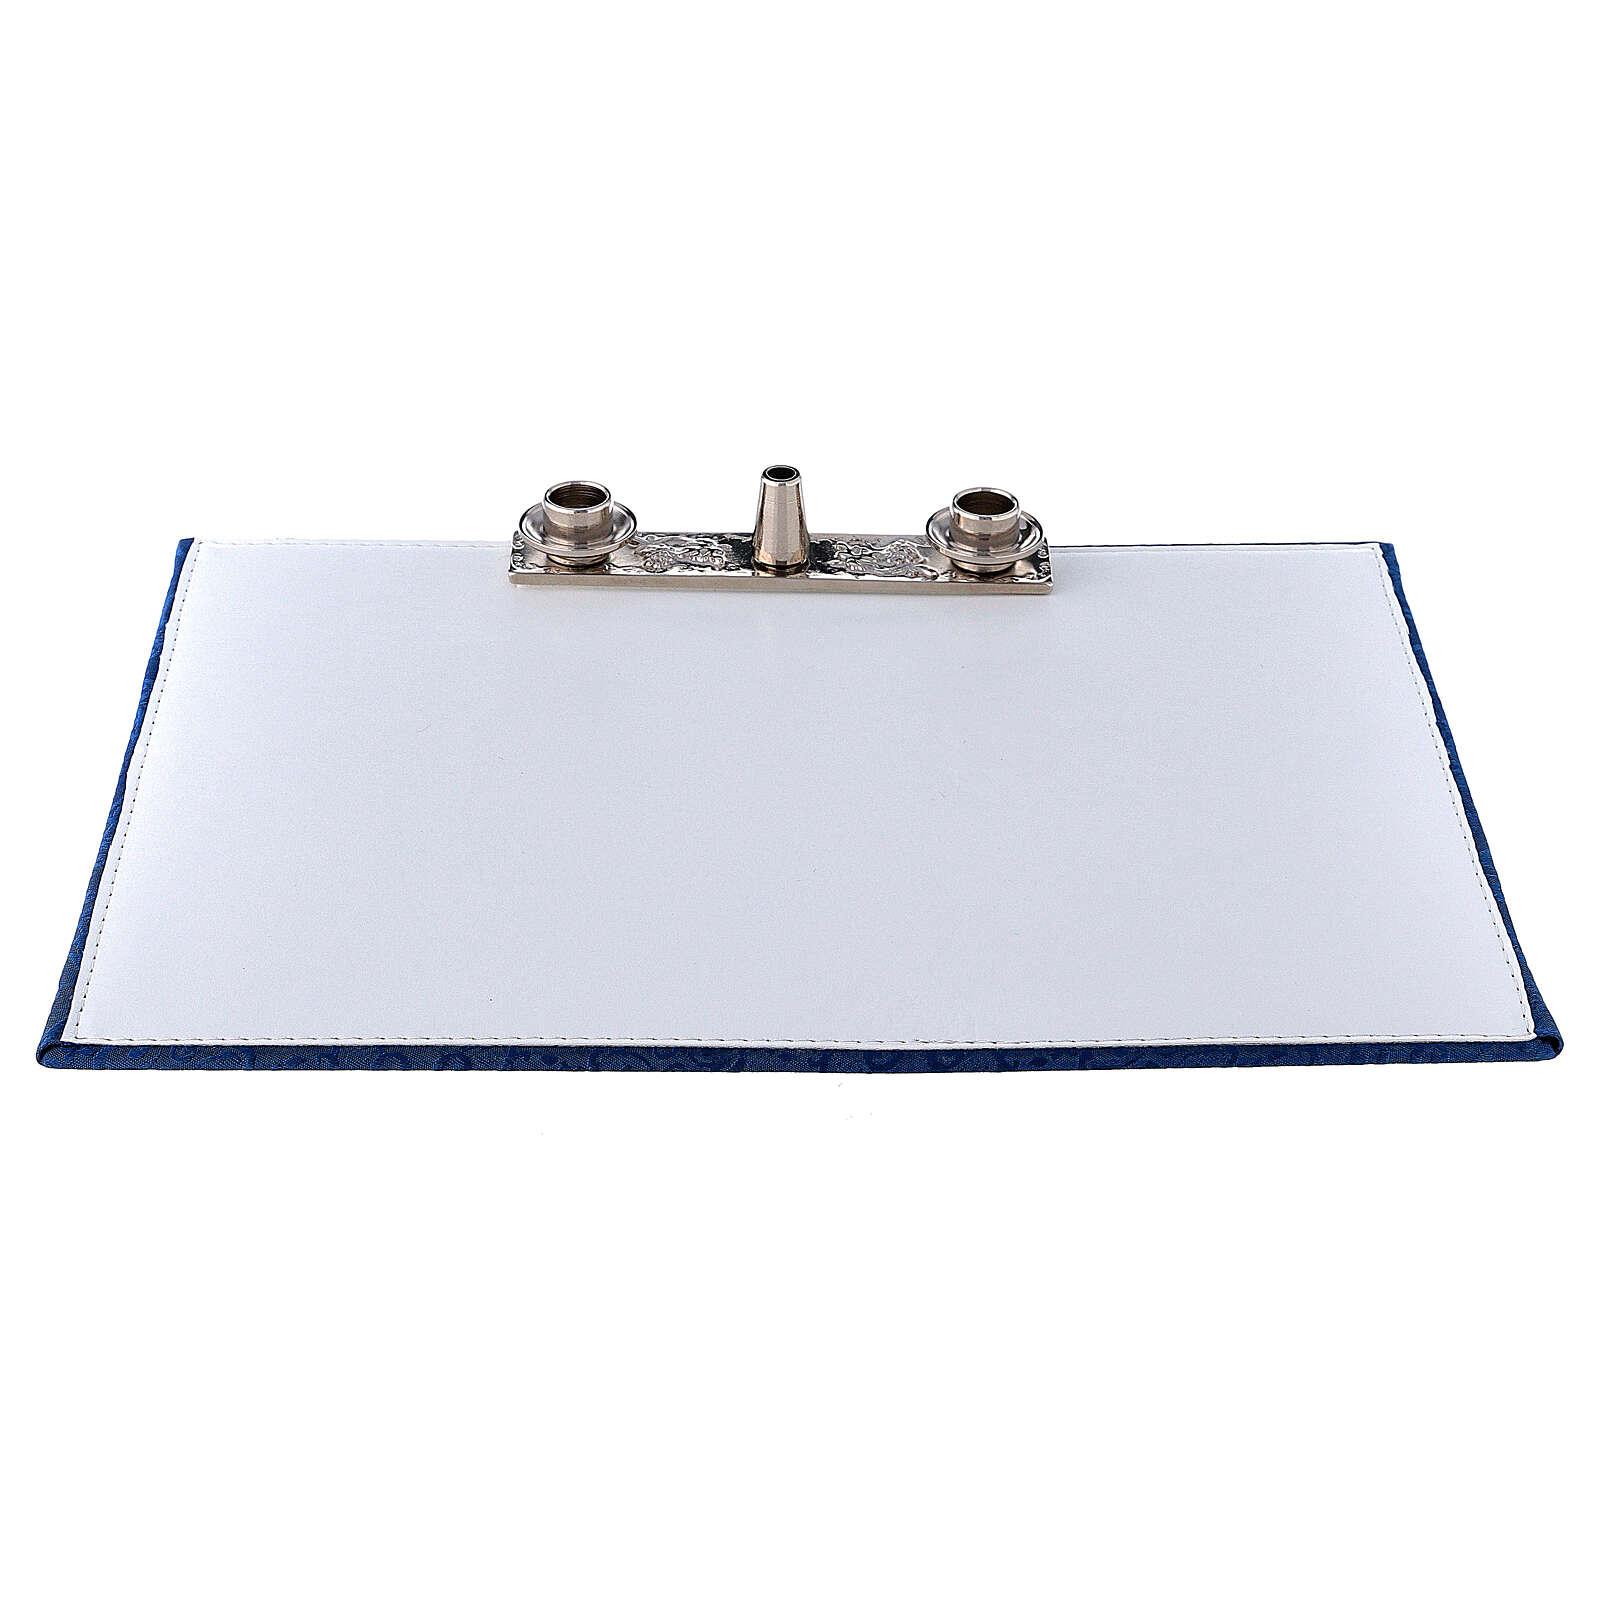 Mass kit bag with blue Jacquard lining 3